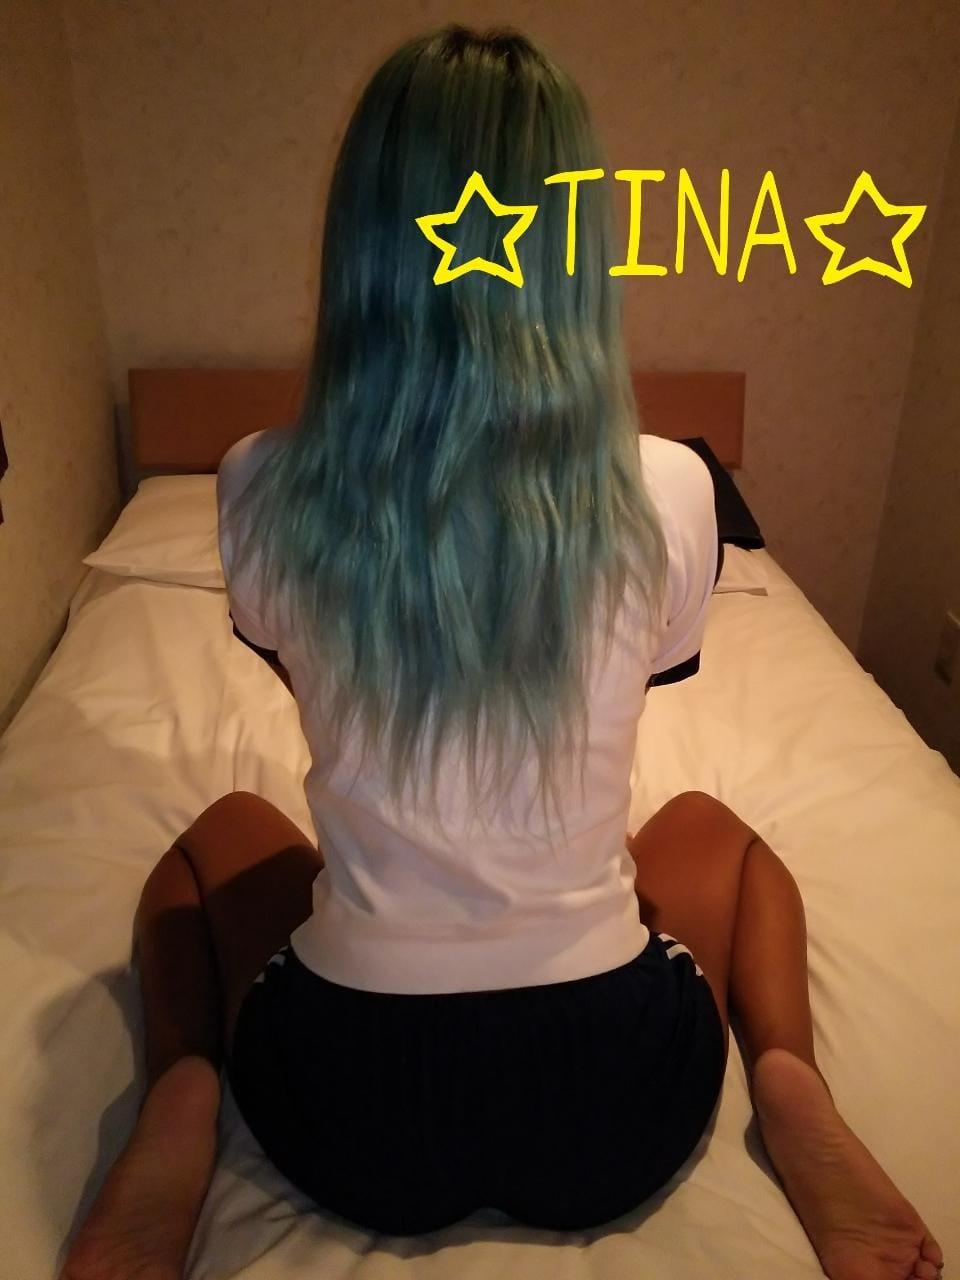 Tina ティナ「今日出勤するよ∩( ・ω・)∩」05/21(火) 12:53   Tina ティナの写メ・風俗動画